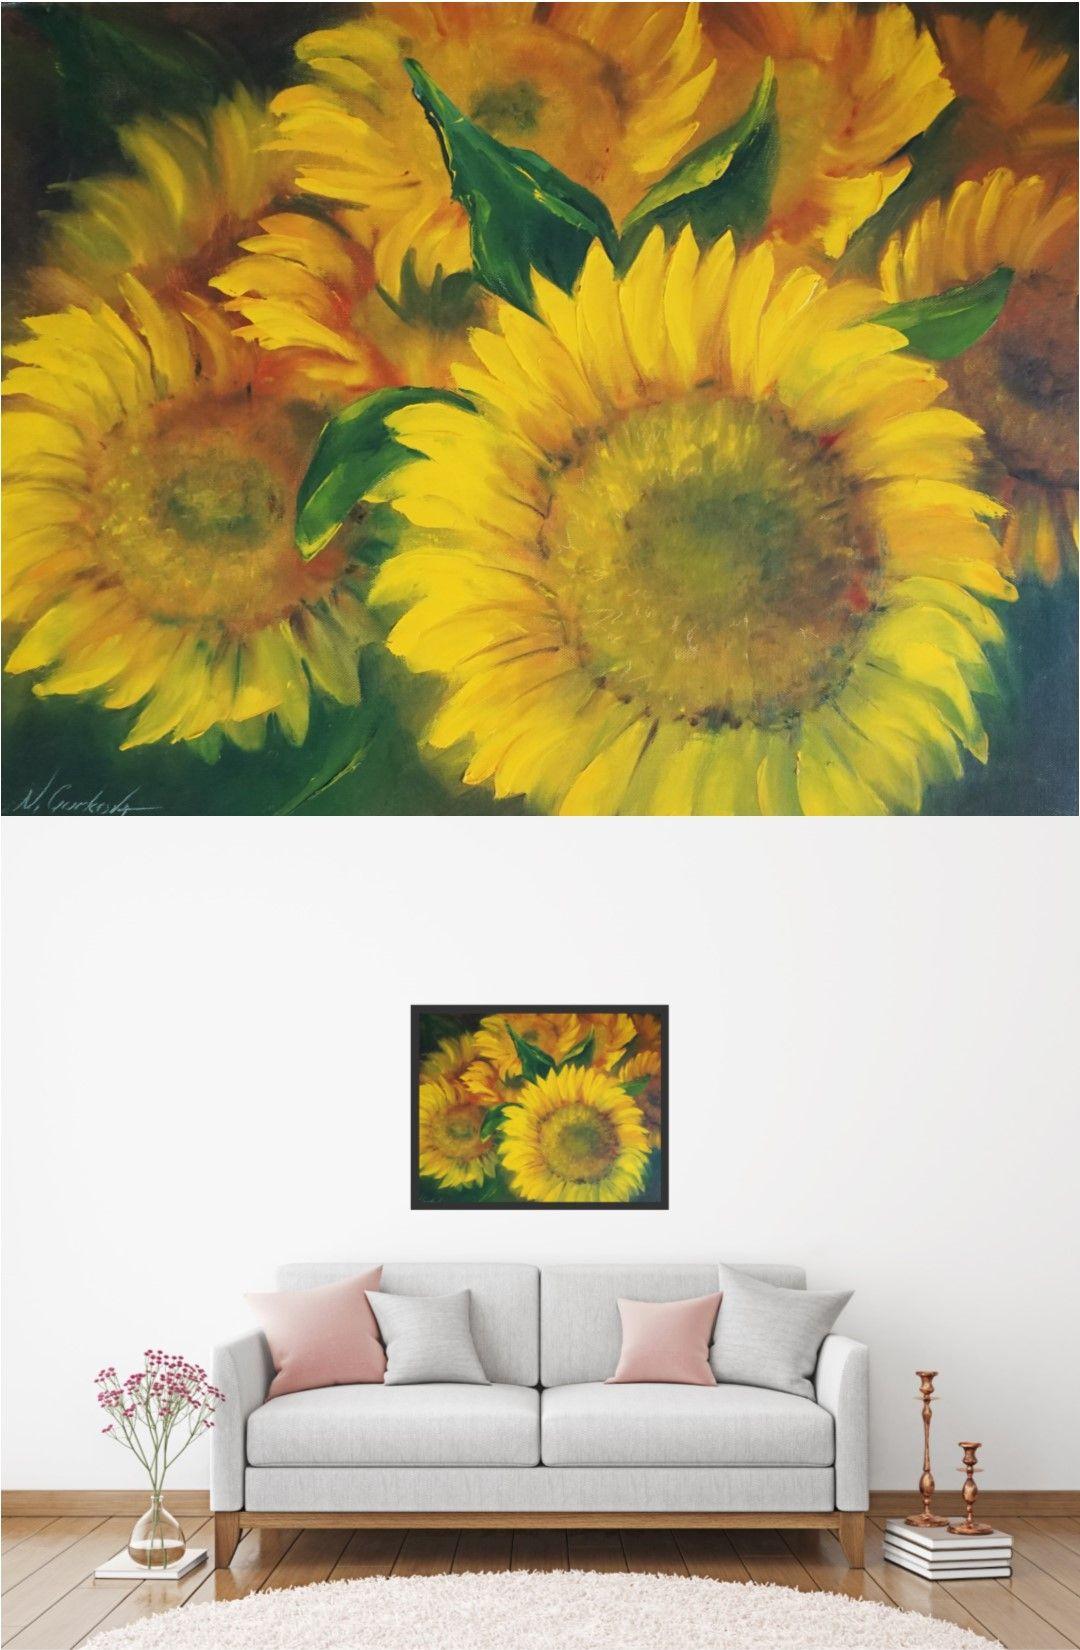 Sunflower Oil Painting Original Horizontal Floral Canvas Artwork